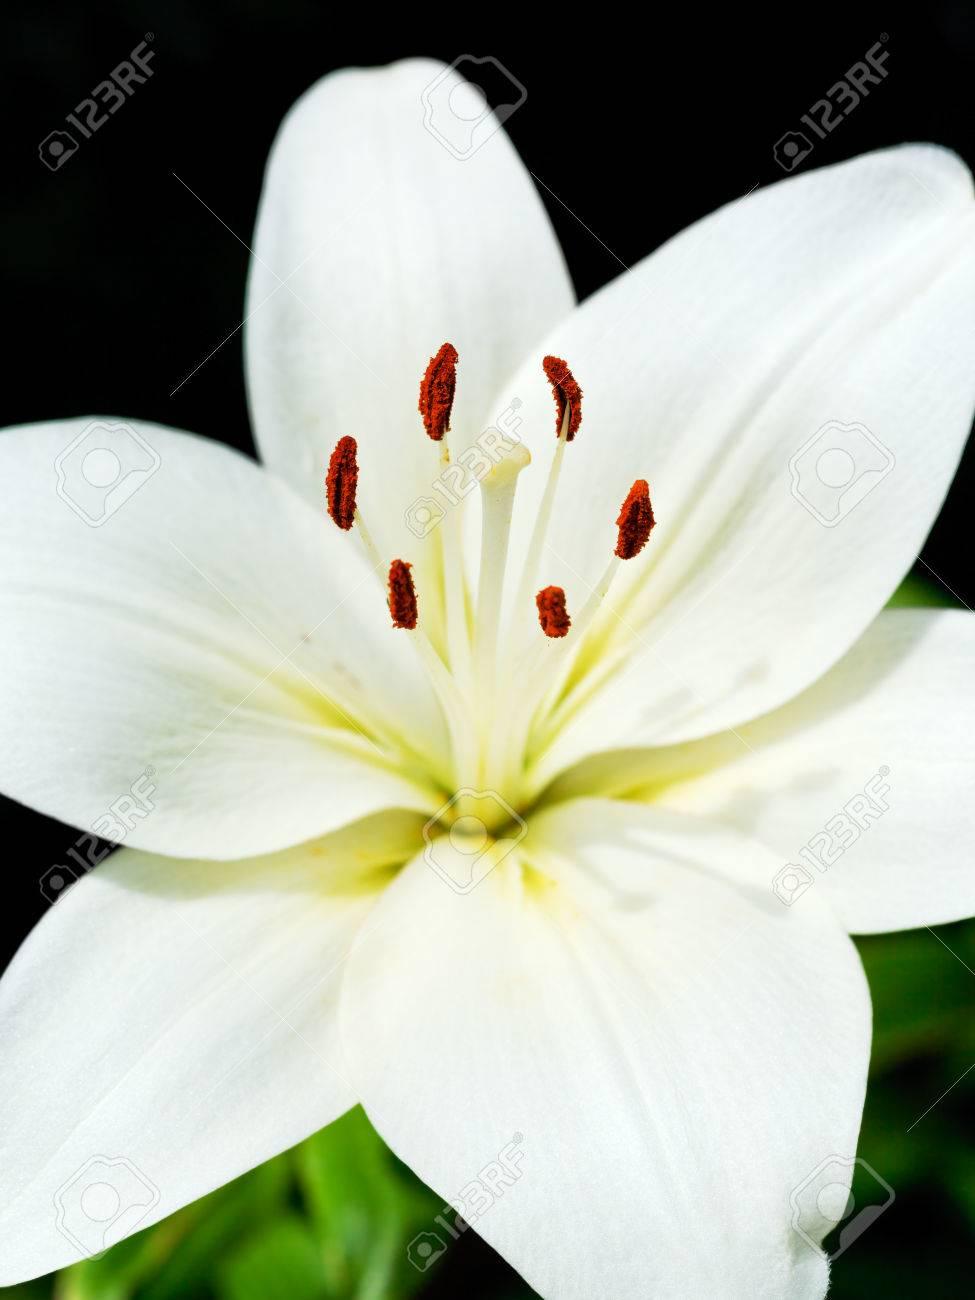 White flower of lilium candidum madonna lily close up stock photo stock photo white flower of lilium candidum madonna lily close up izmirmasajfo